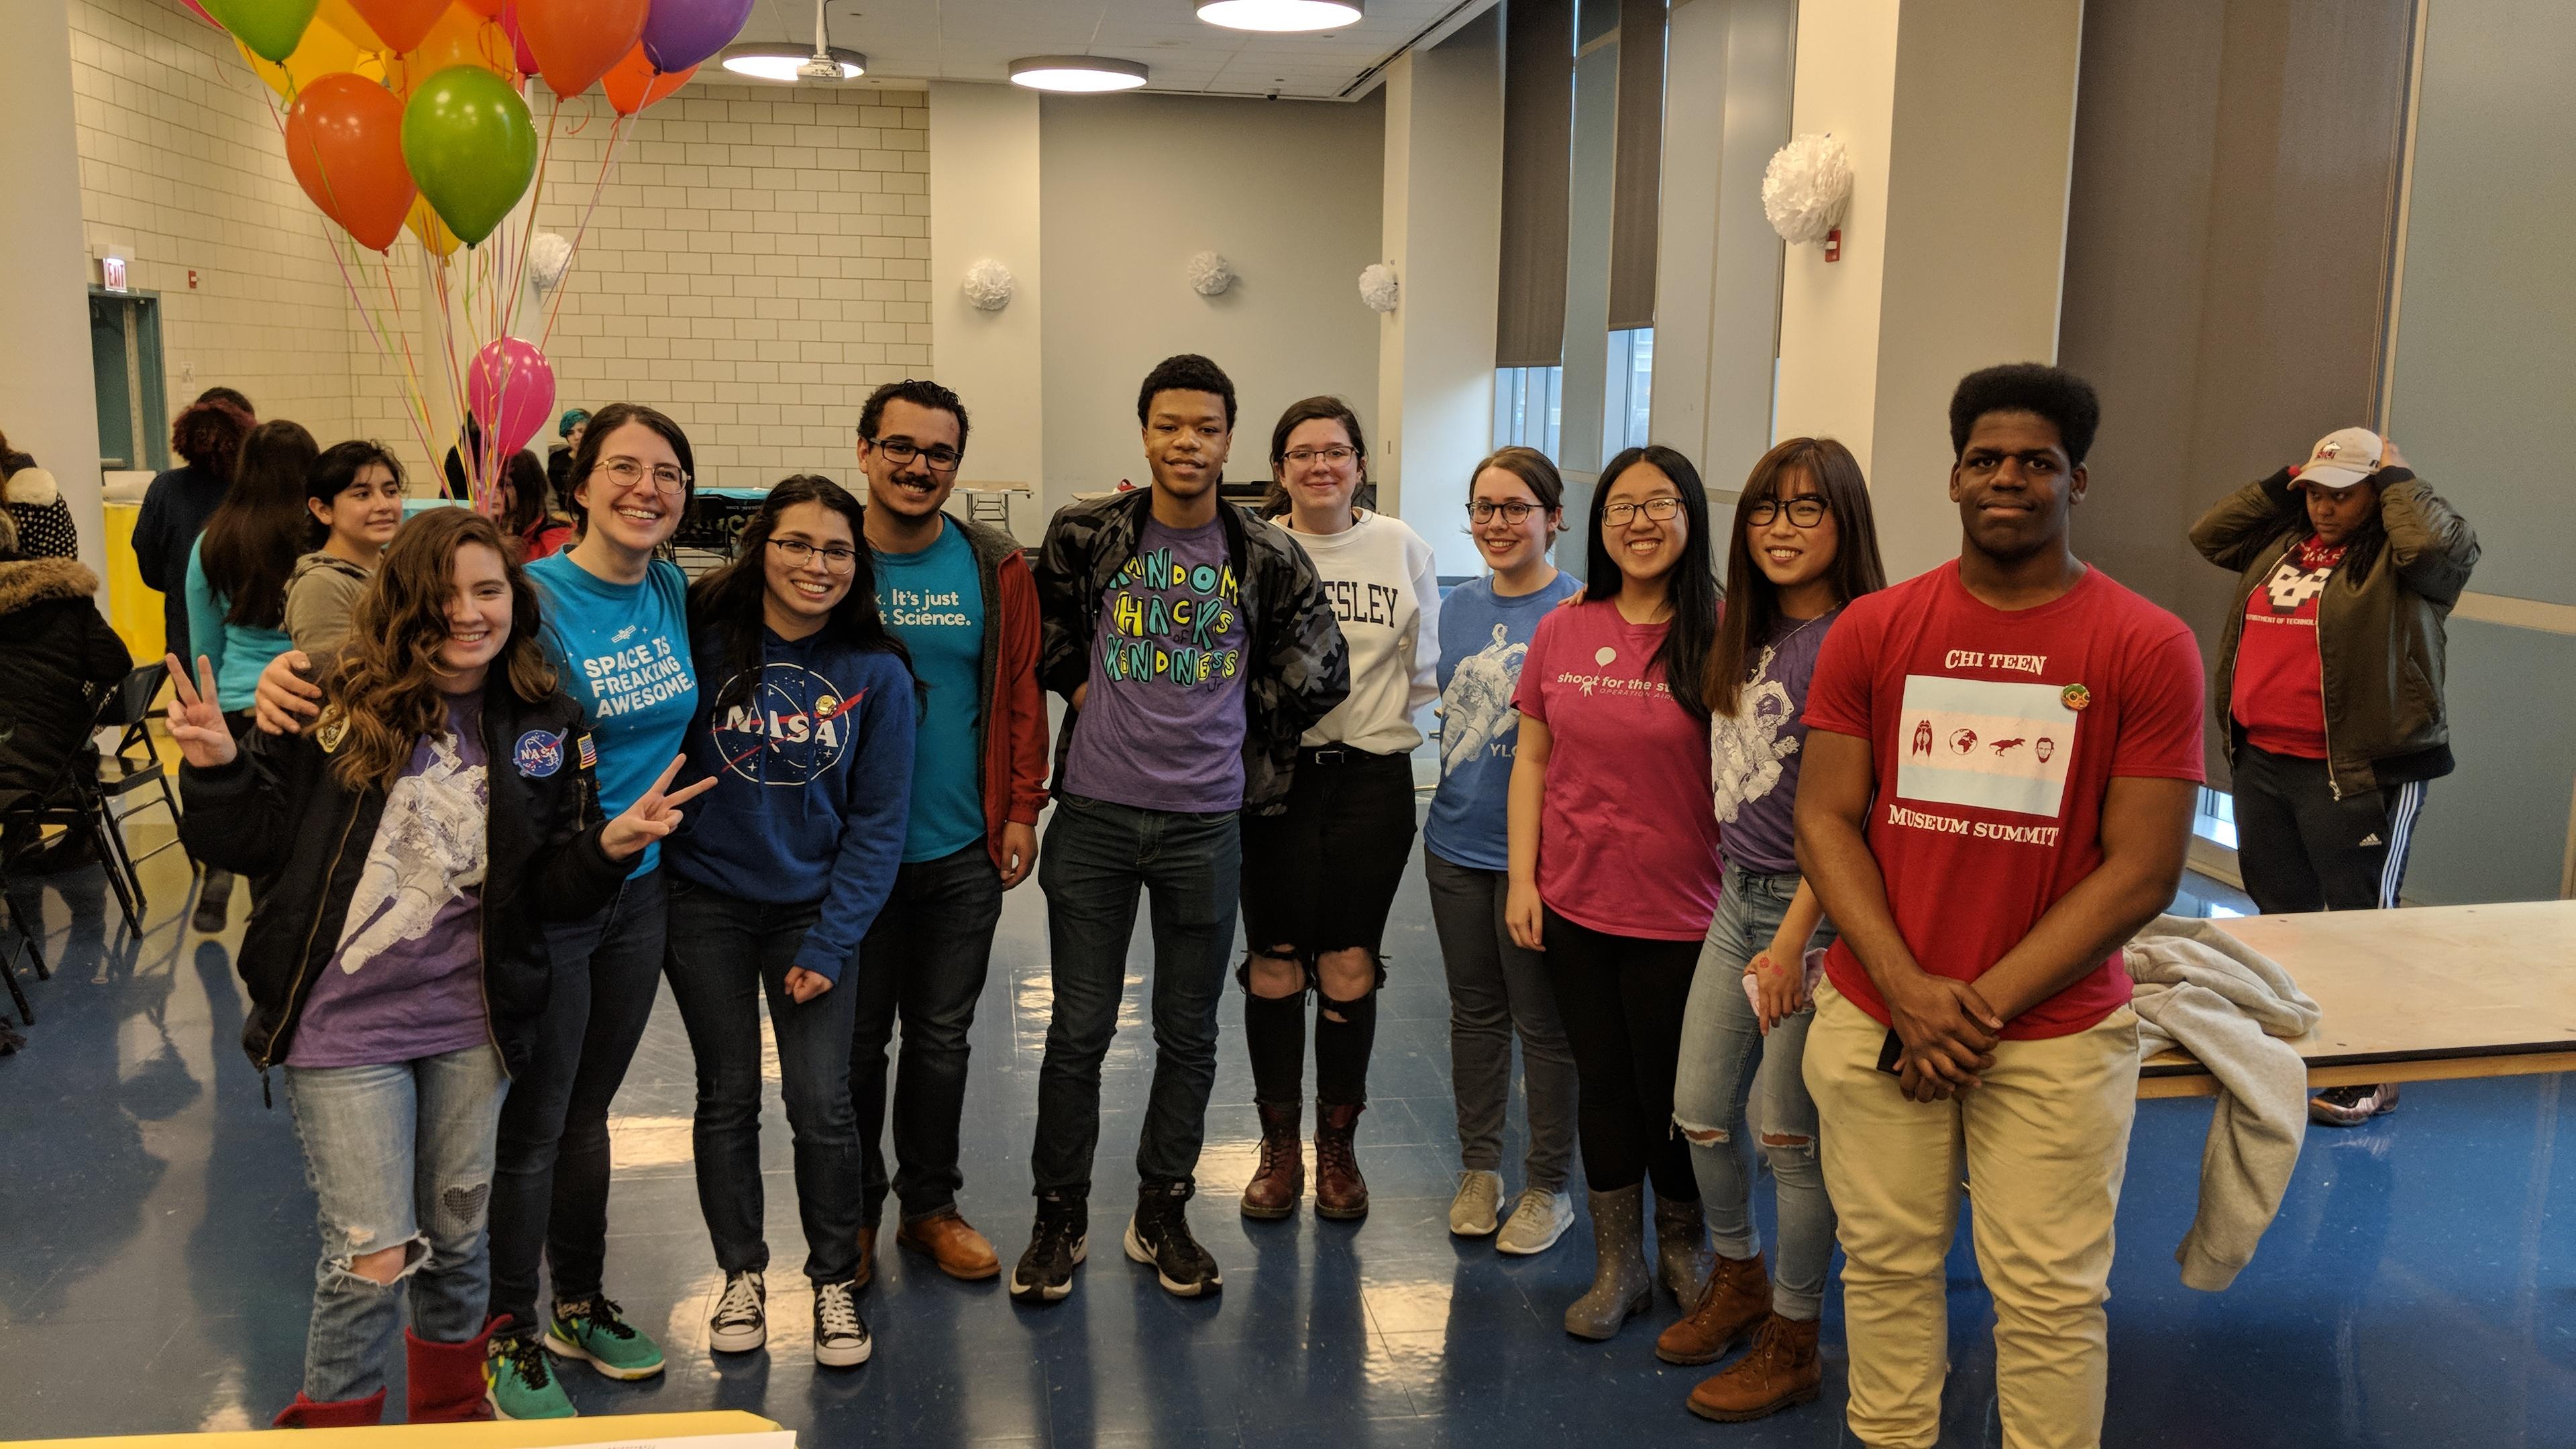 Adler Planetarium's Youth Leadership Council